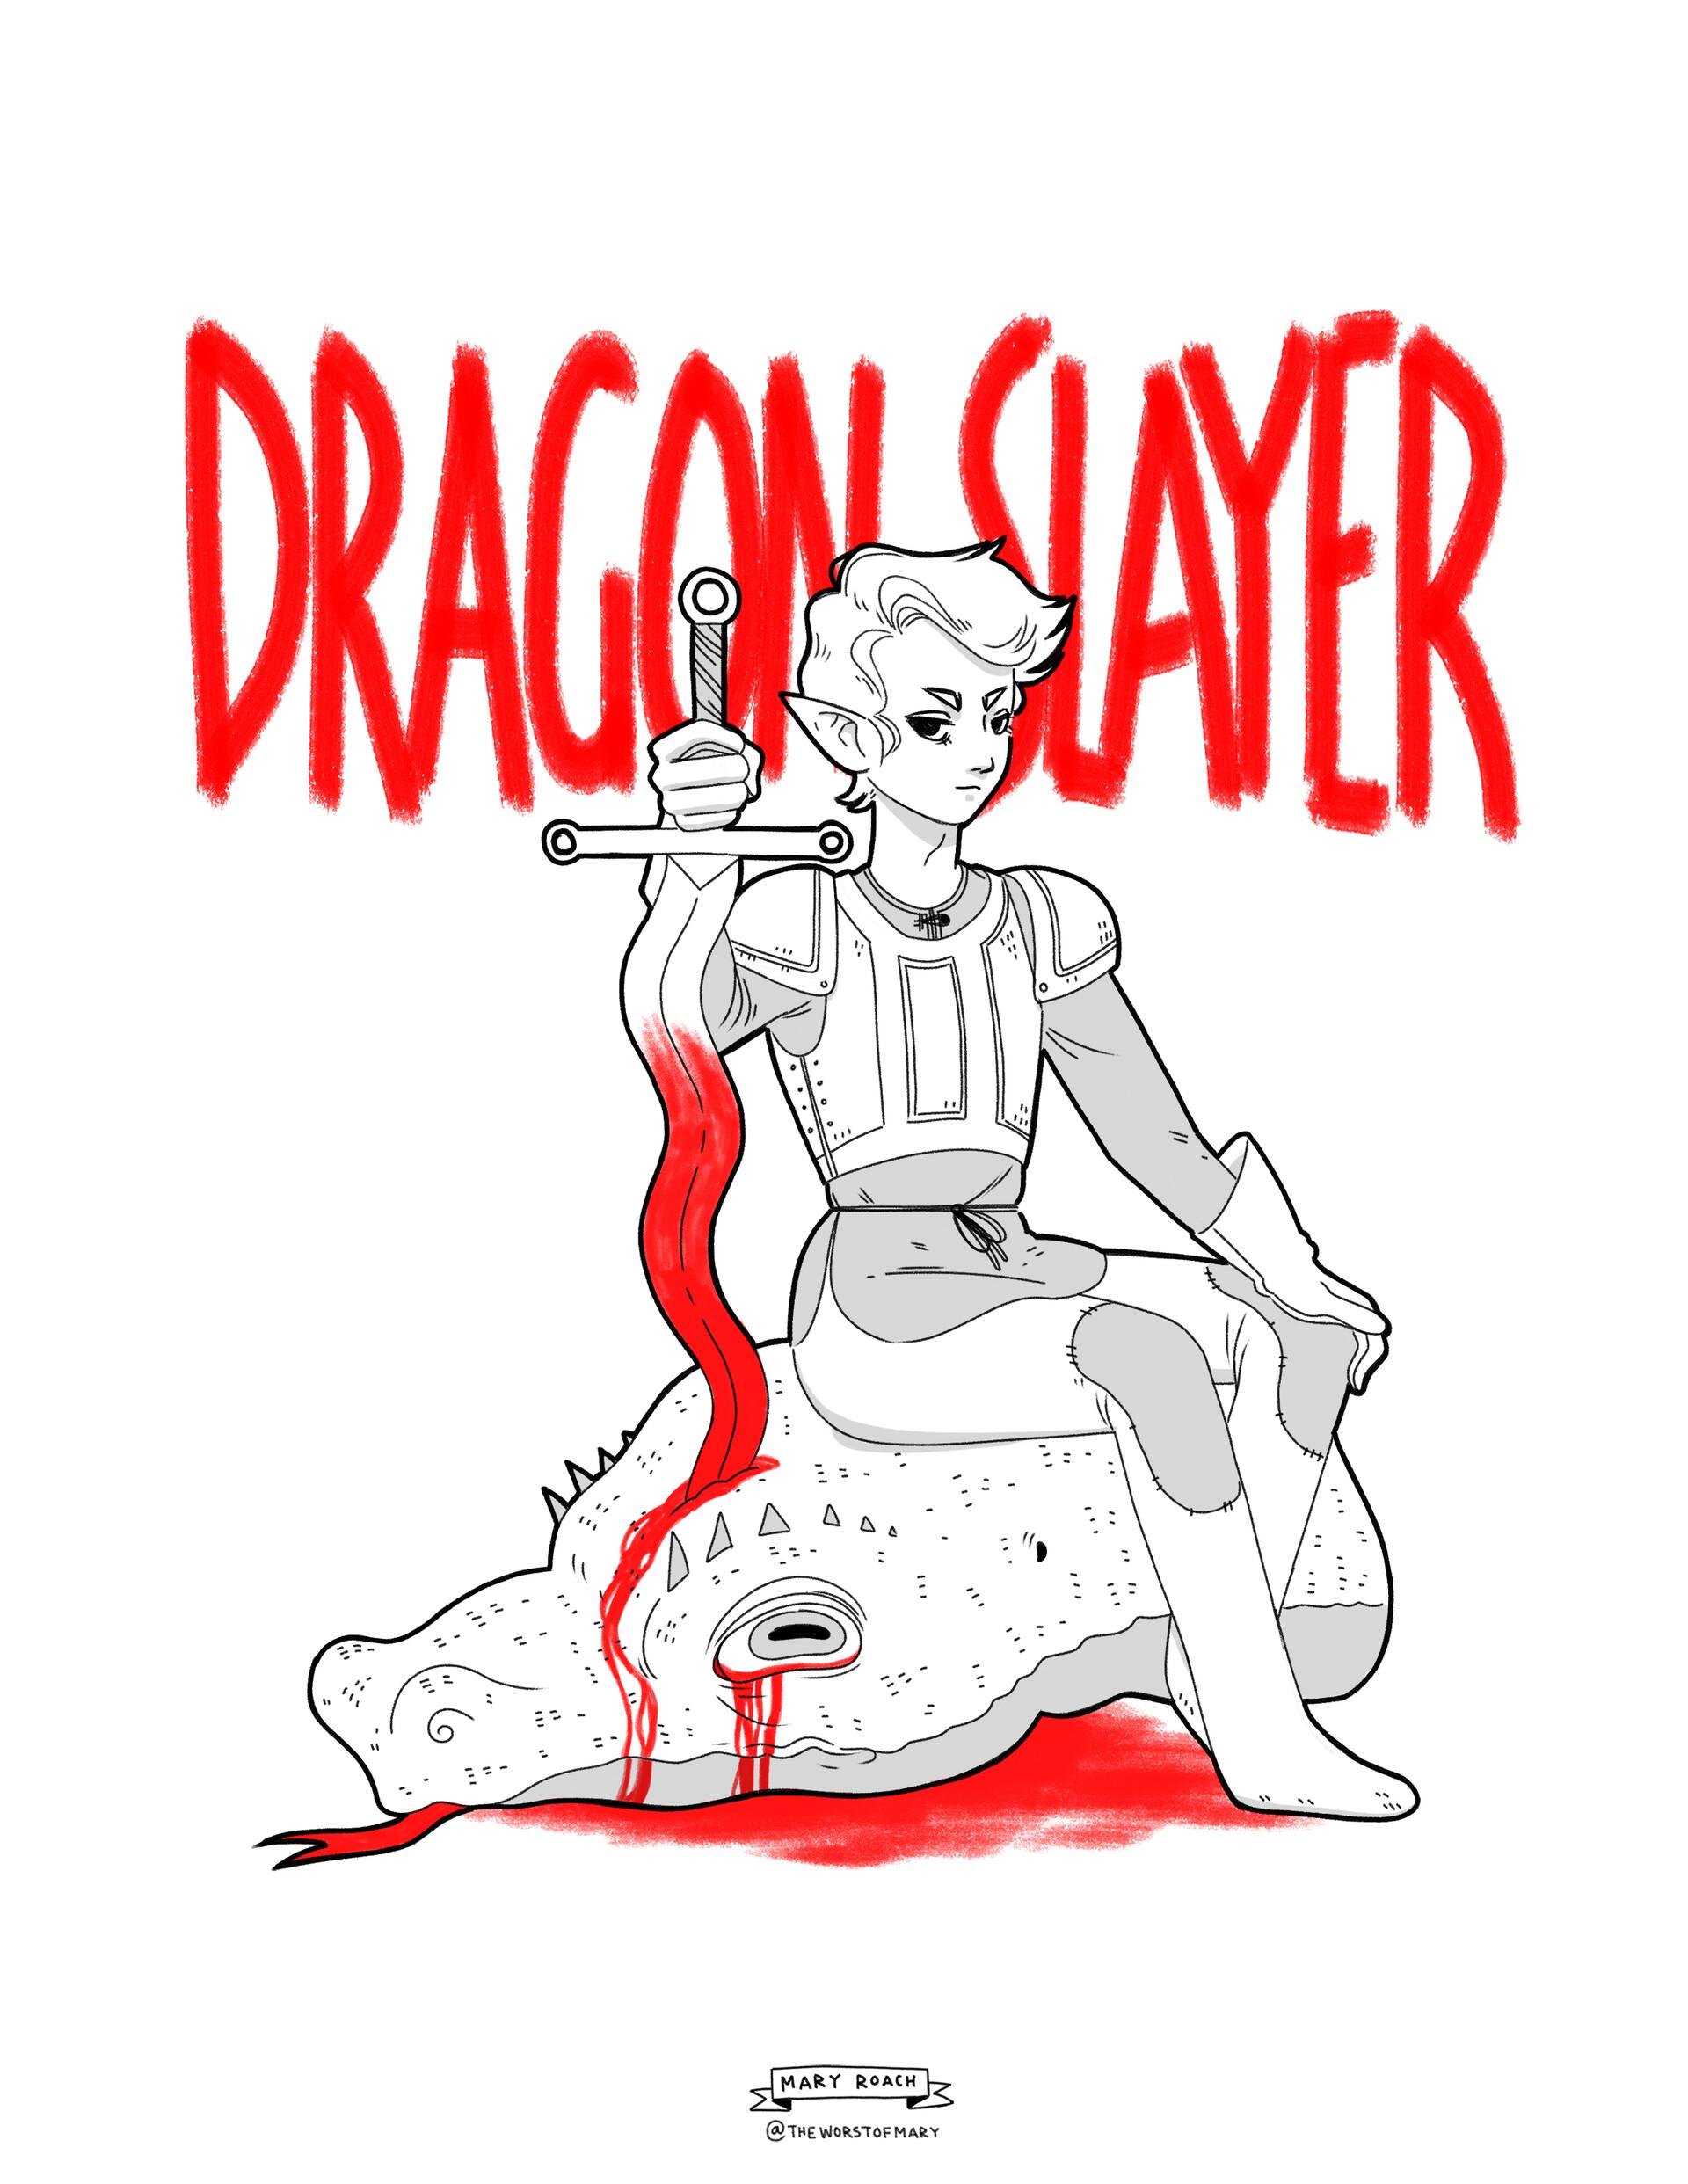 Mary roach dragonslayer2